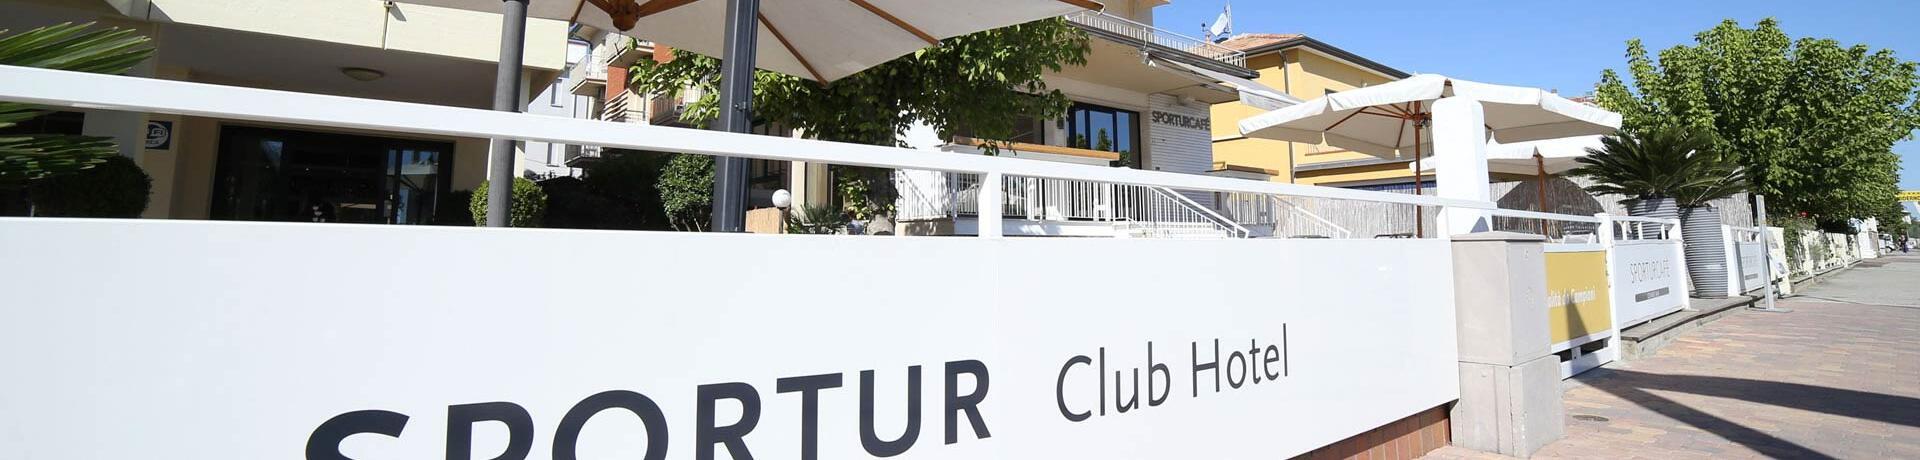 granfondoviadelsale it sportur-club-hotel 012